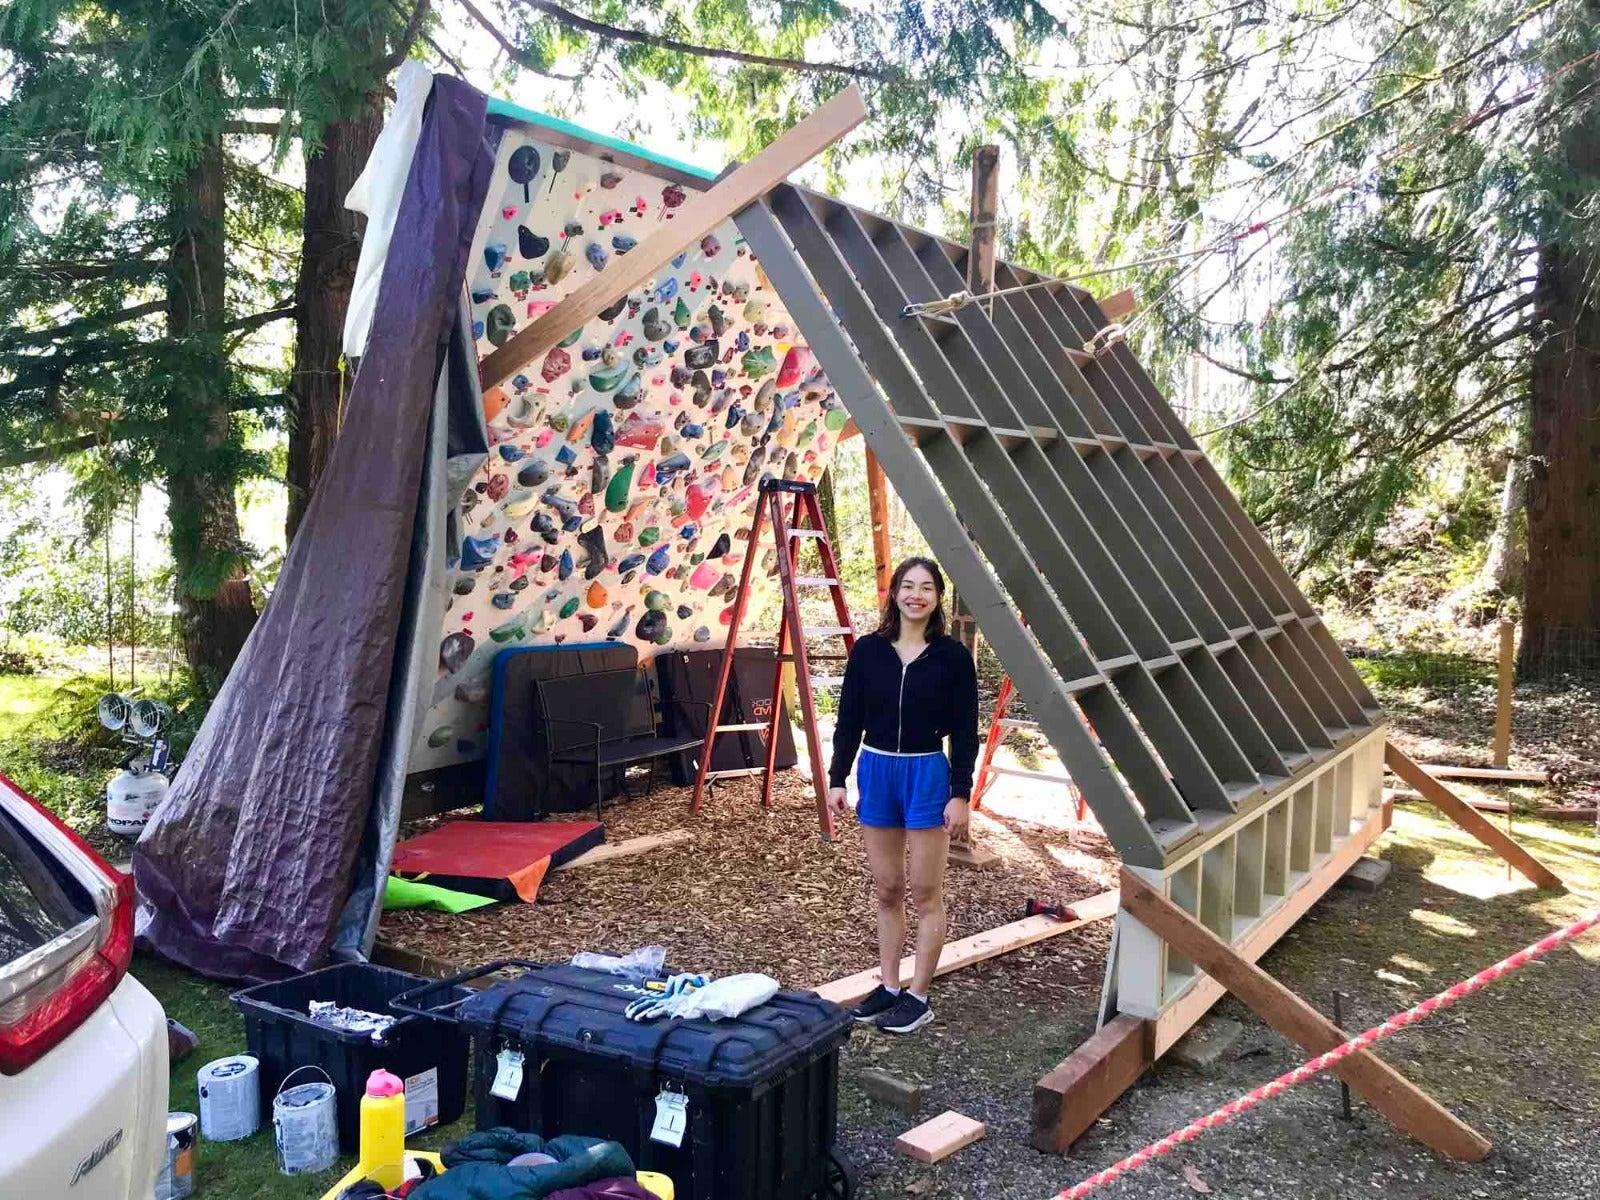 Quinn Mason at work on the bouldering walls.